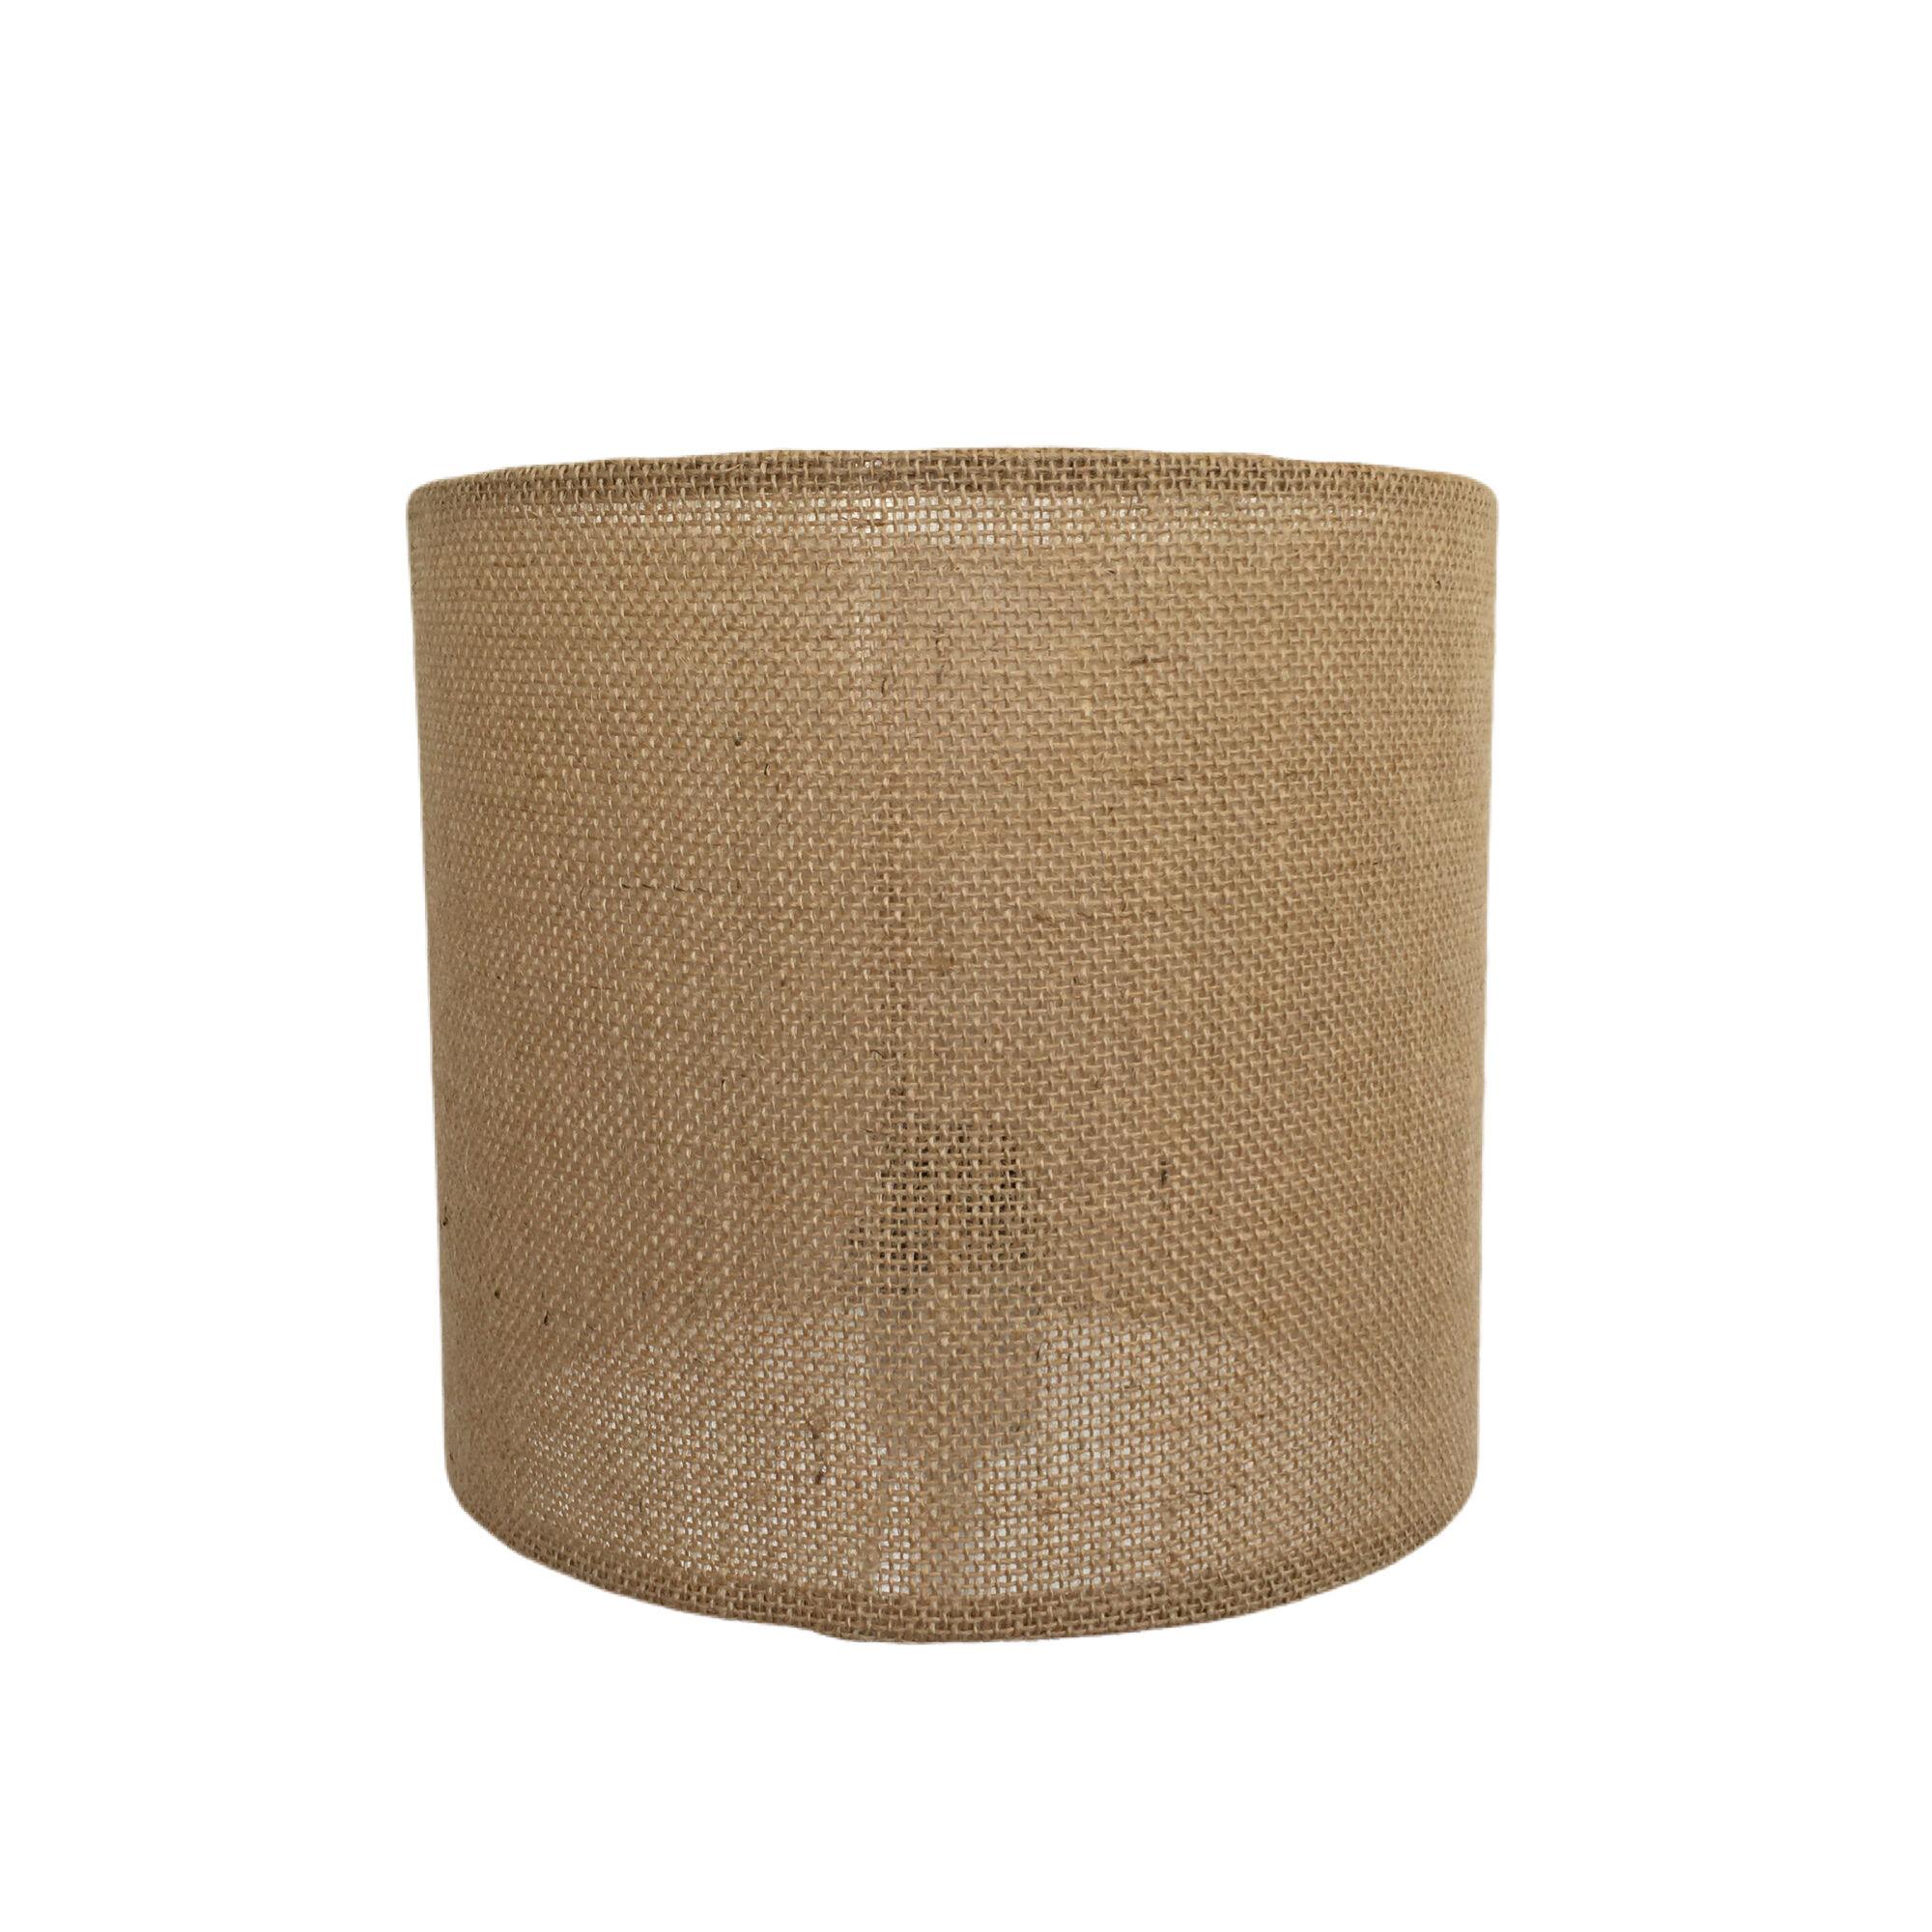 Belamp Suspension toile de jute diamètre 25 cm